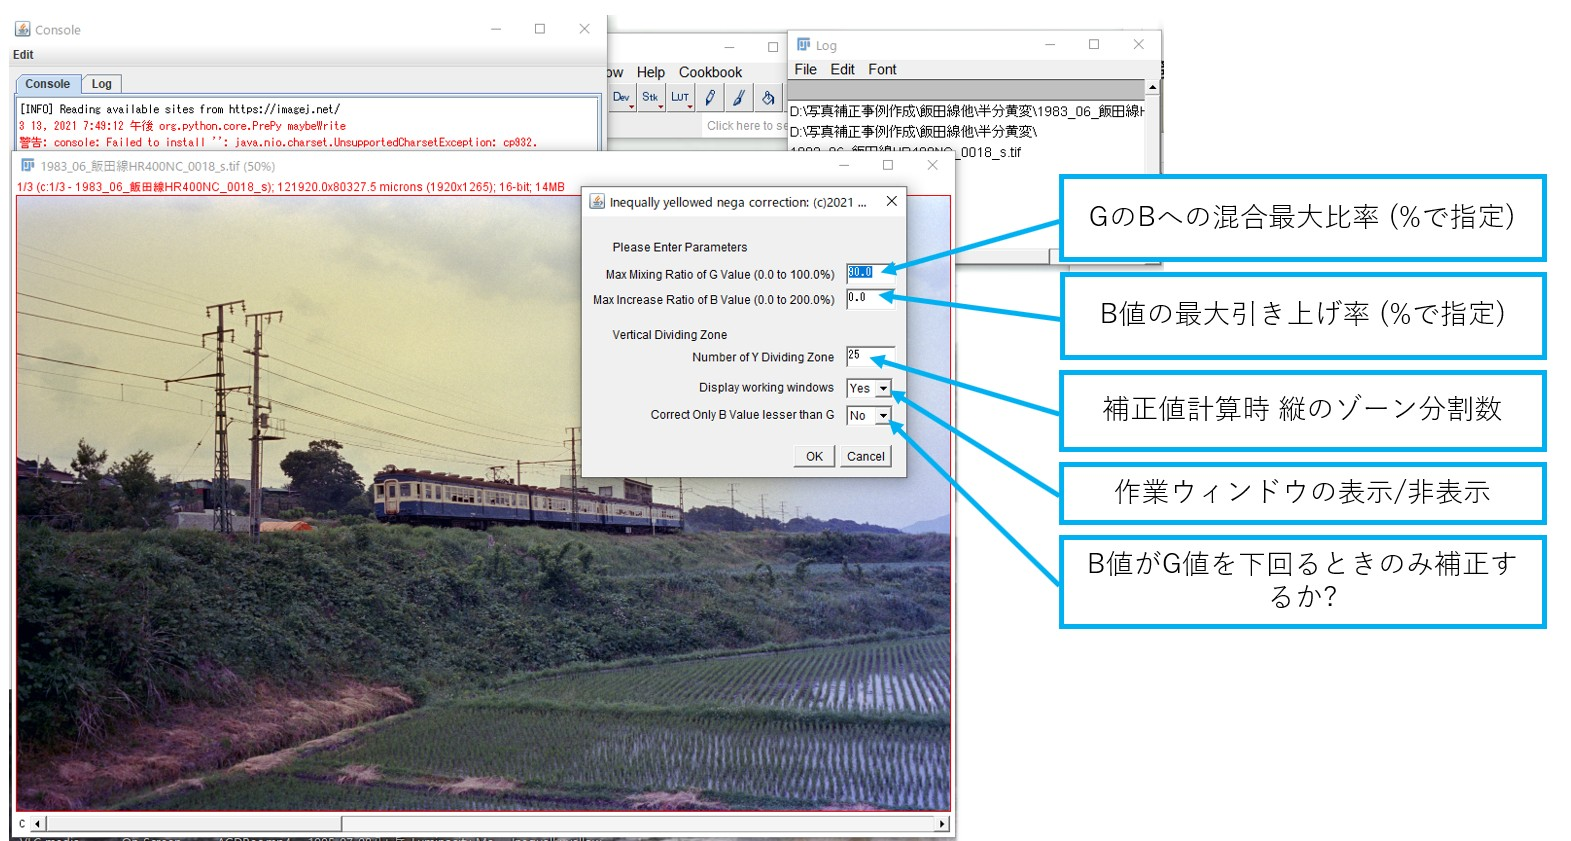 f:id:yasuo_ssi:20210313201146j:plain